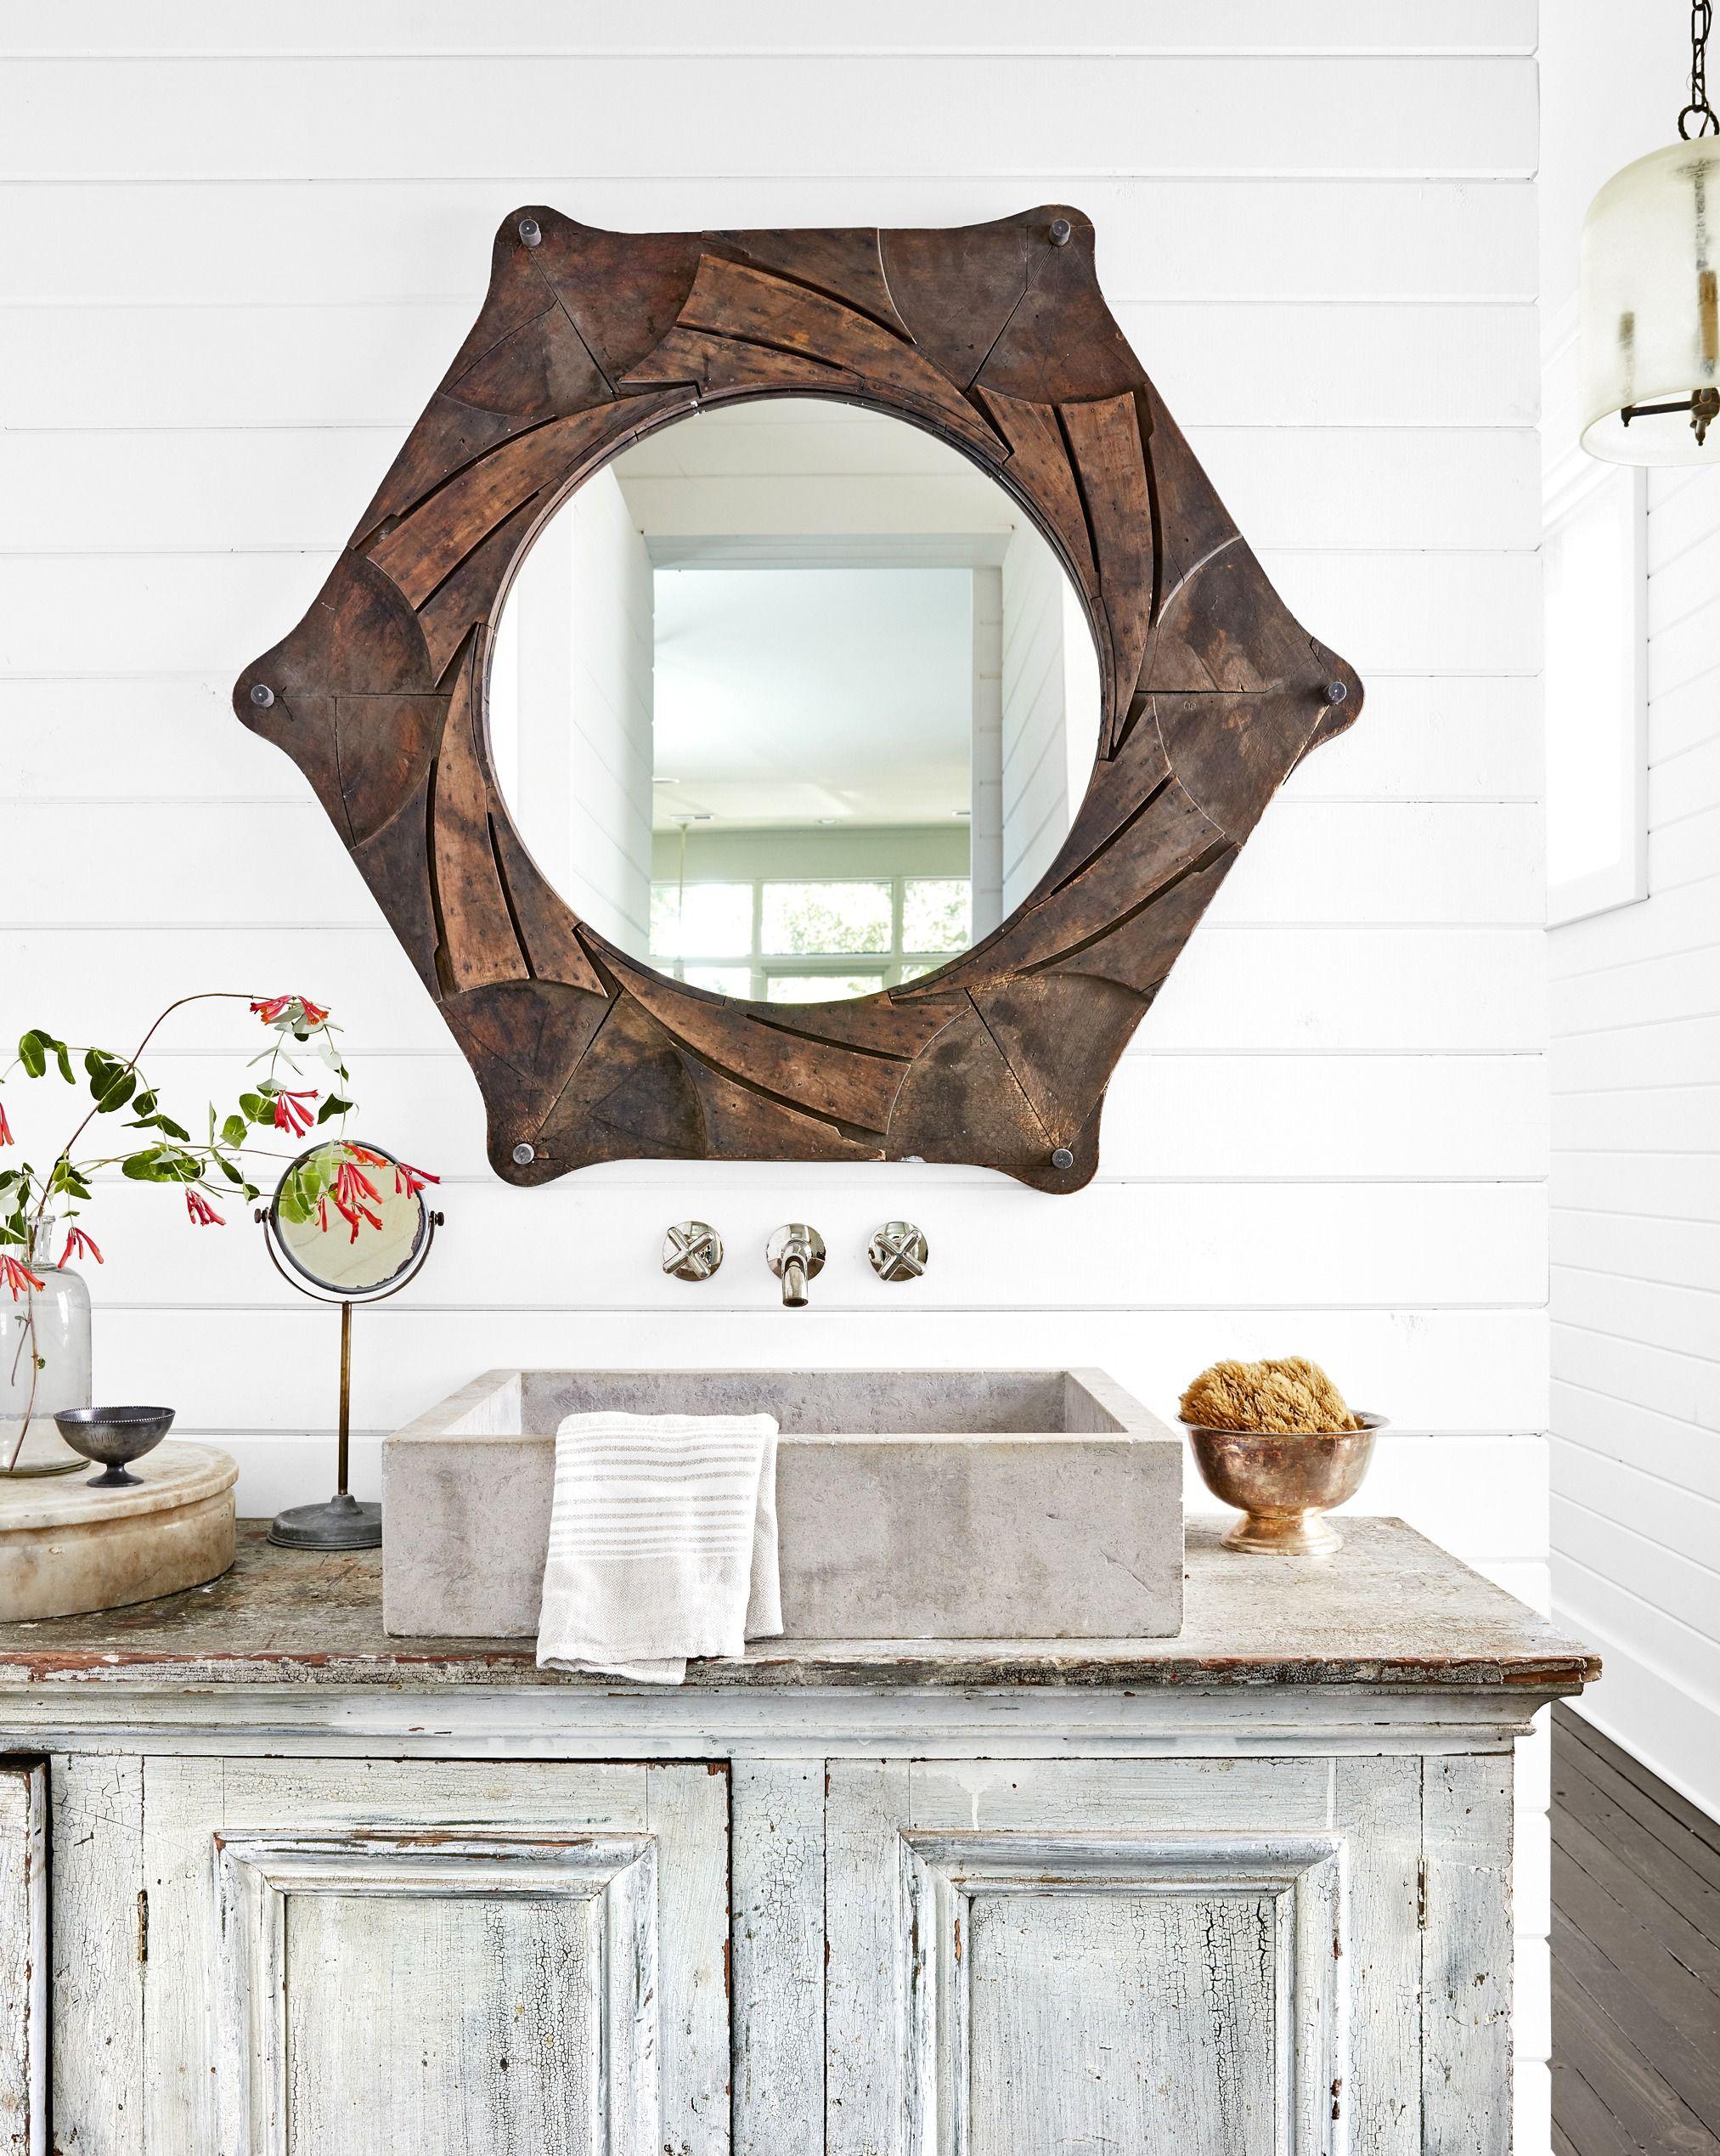 50 Bathroom Decorating Ideas Pictures Of Bathroom Decor And Designs